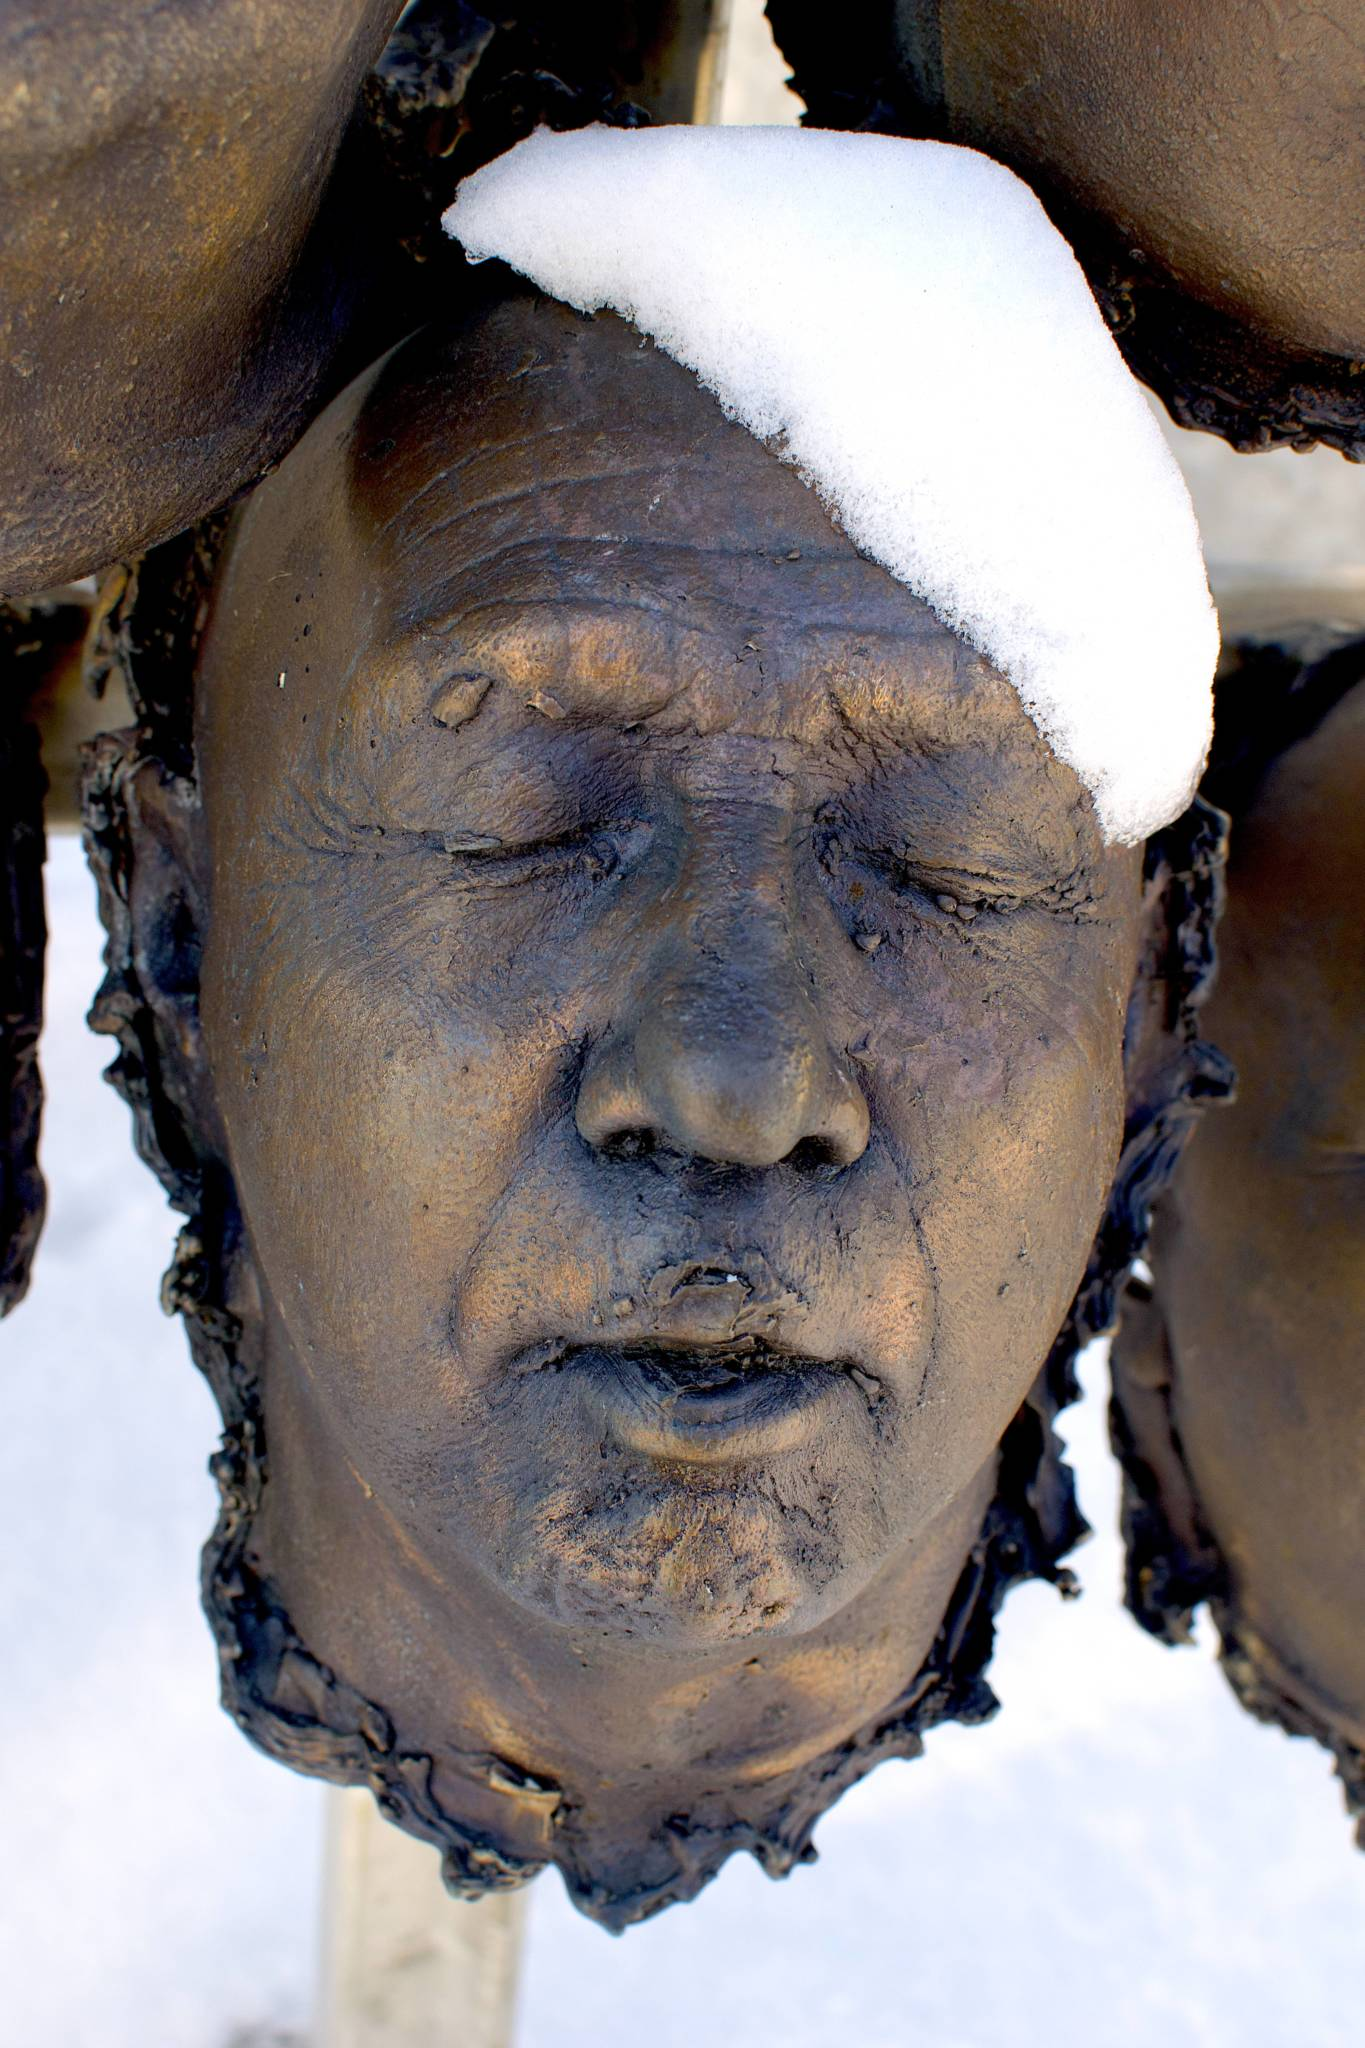 100 Bronze-cast Faces to Commemorate the Centenary of Armistice 5